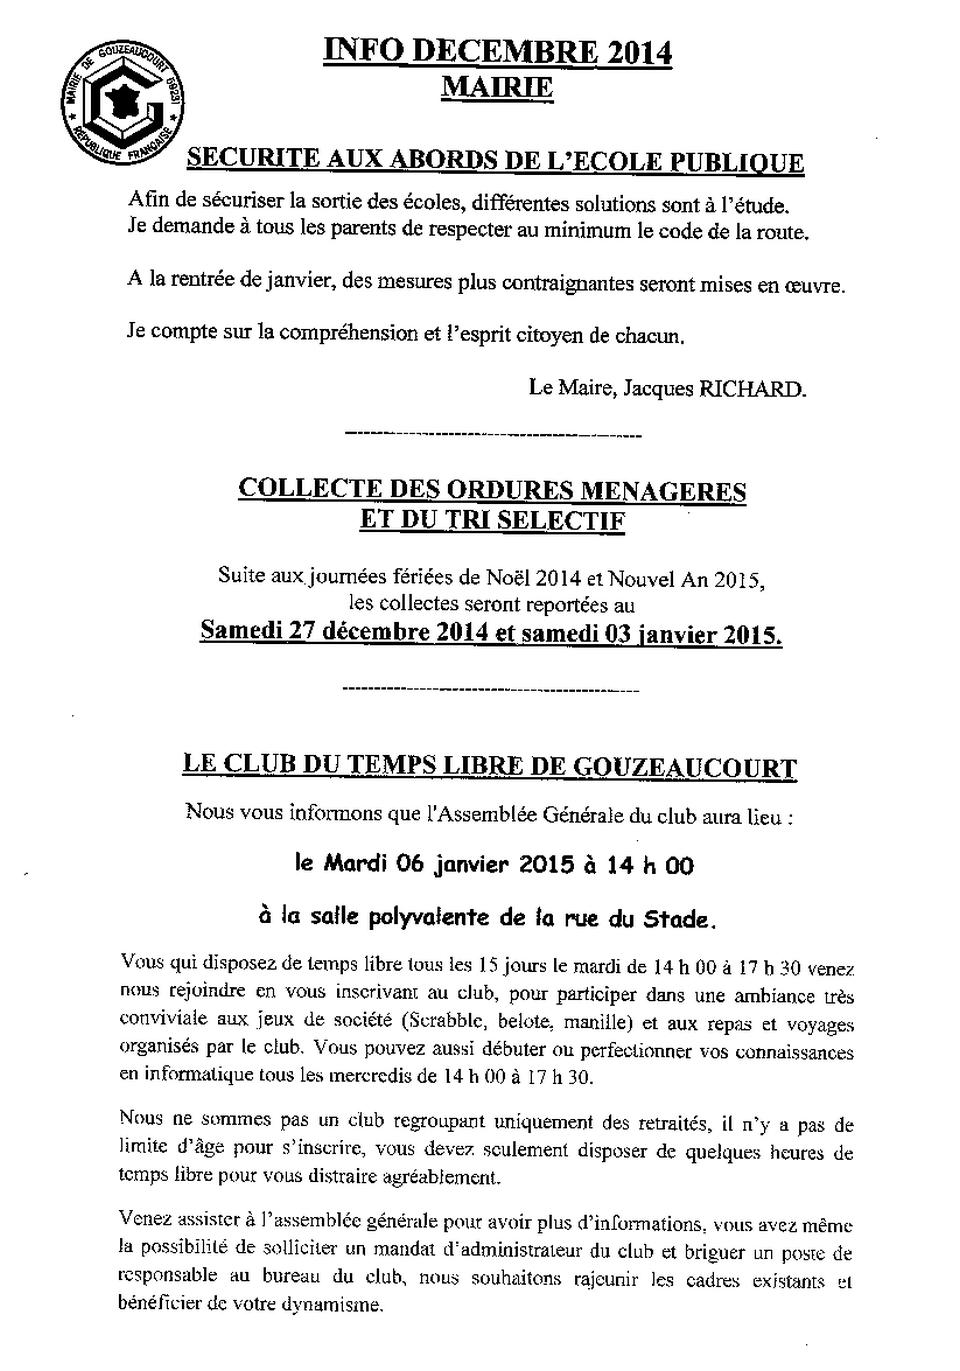 info 1 dec 2014